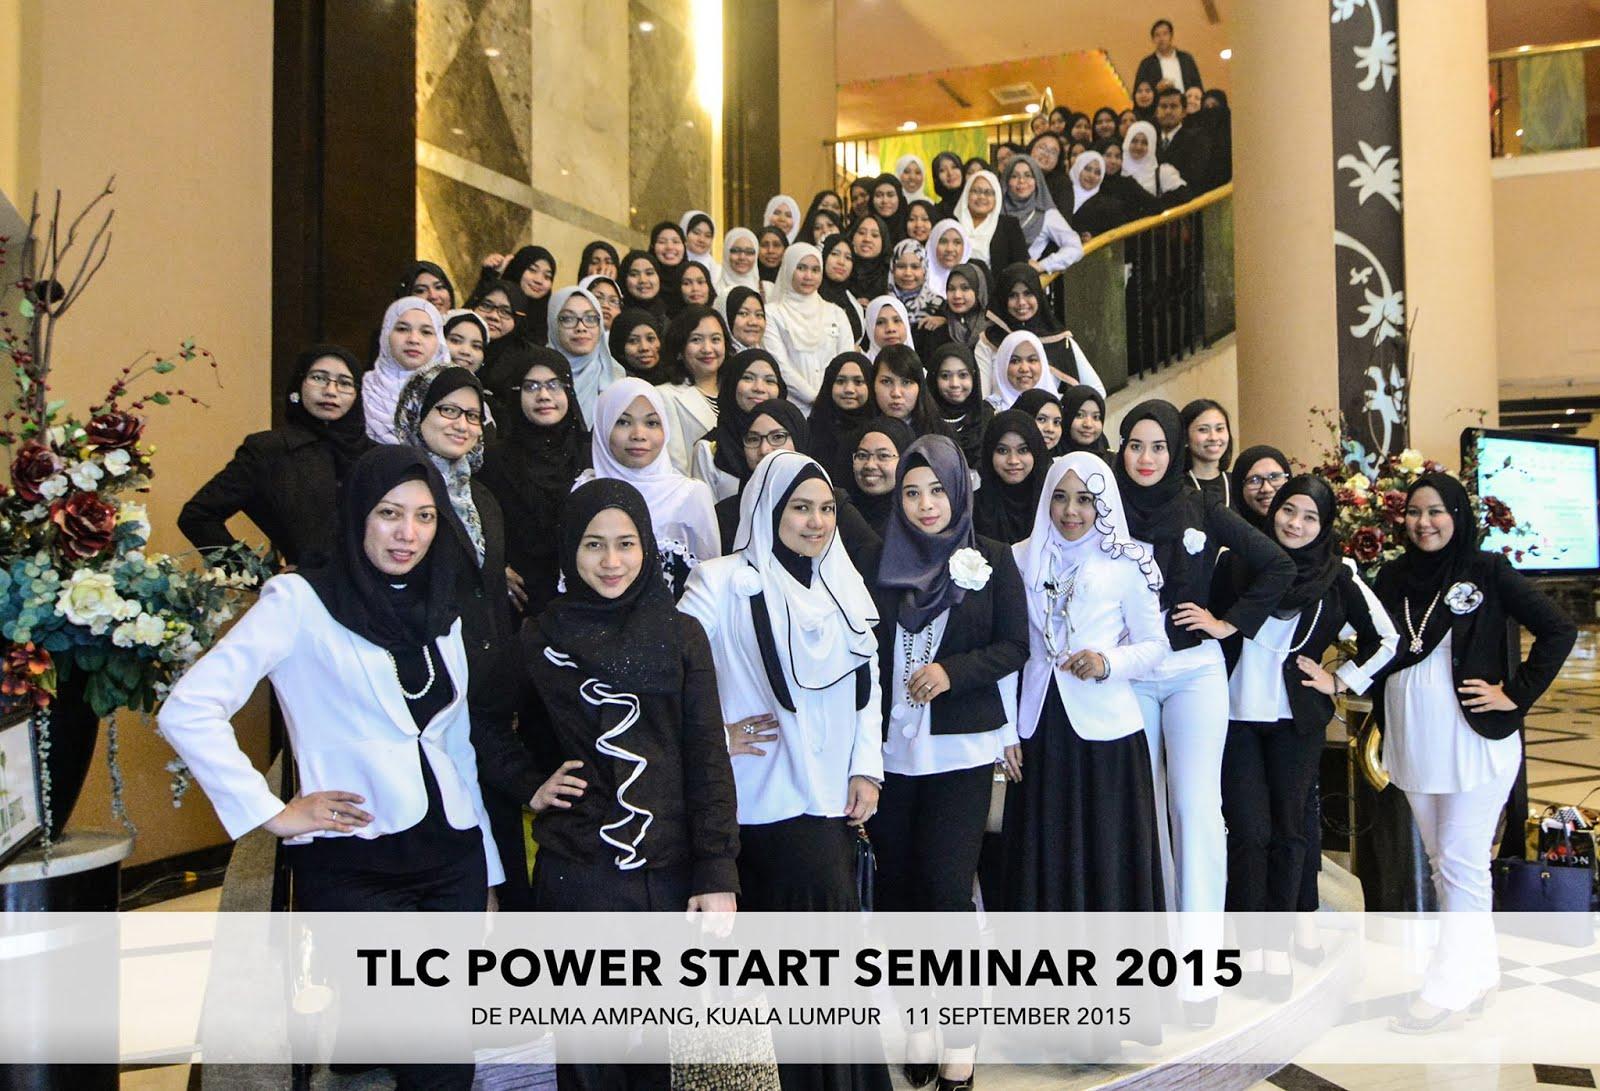 TLC SEMINAR 2015